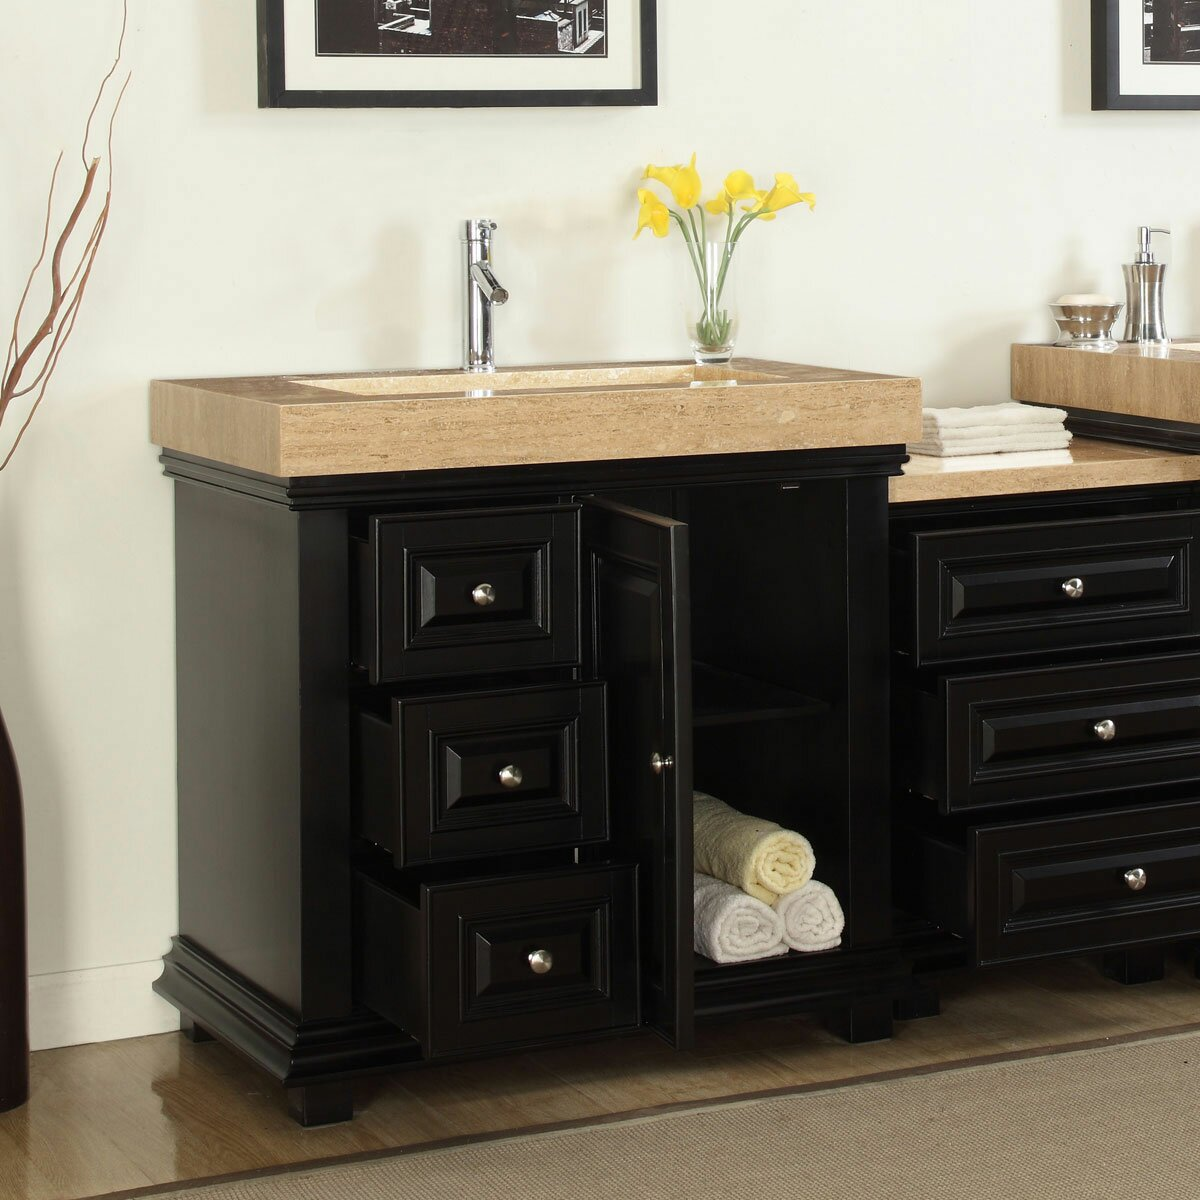 "Silkroad Exclusive 55 5"" Single Integrated Bathroom Vanity Set with Drai"